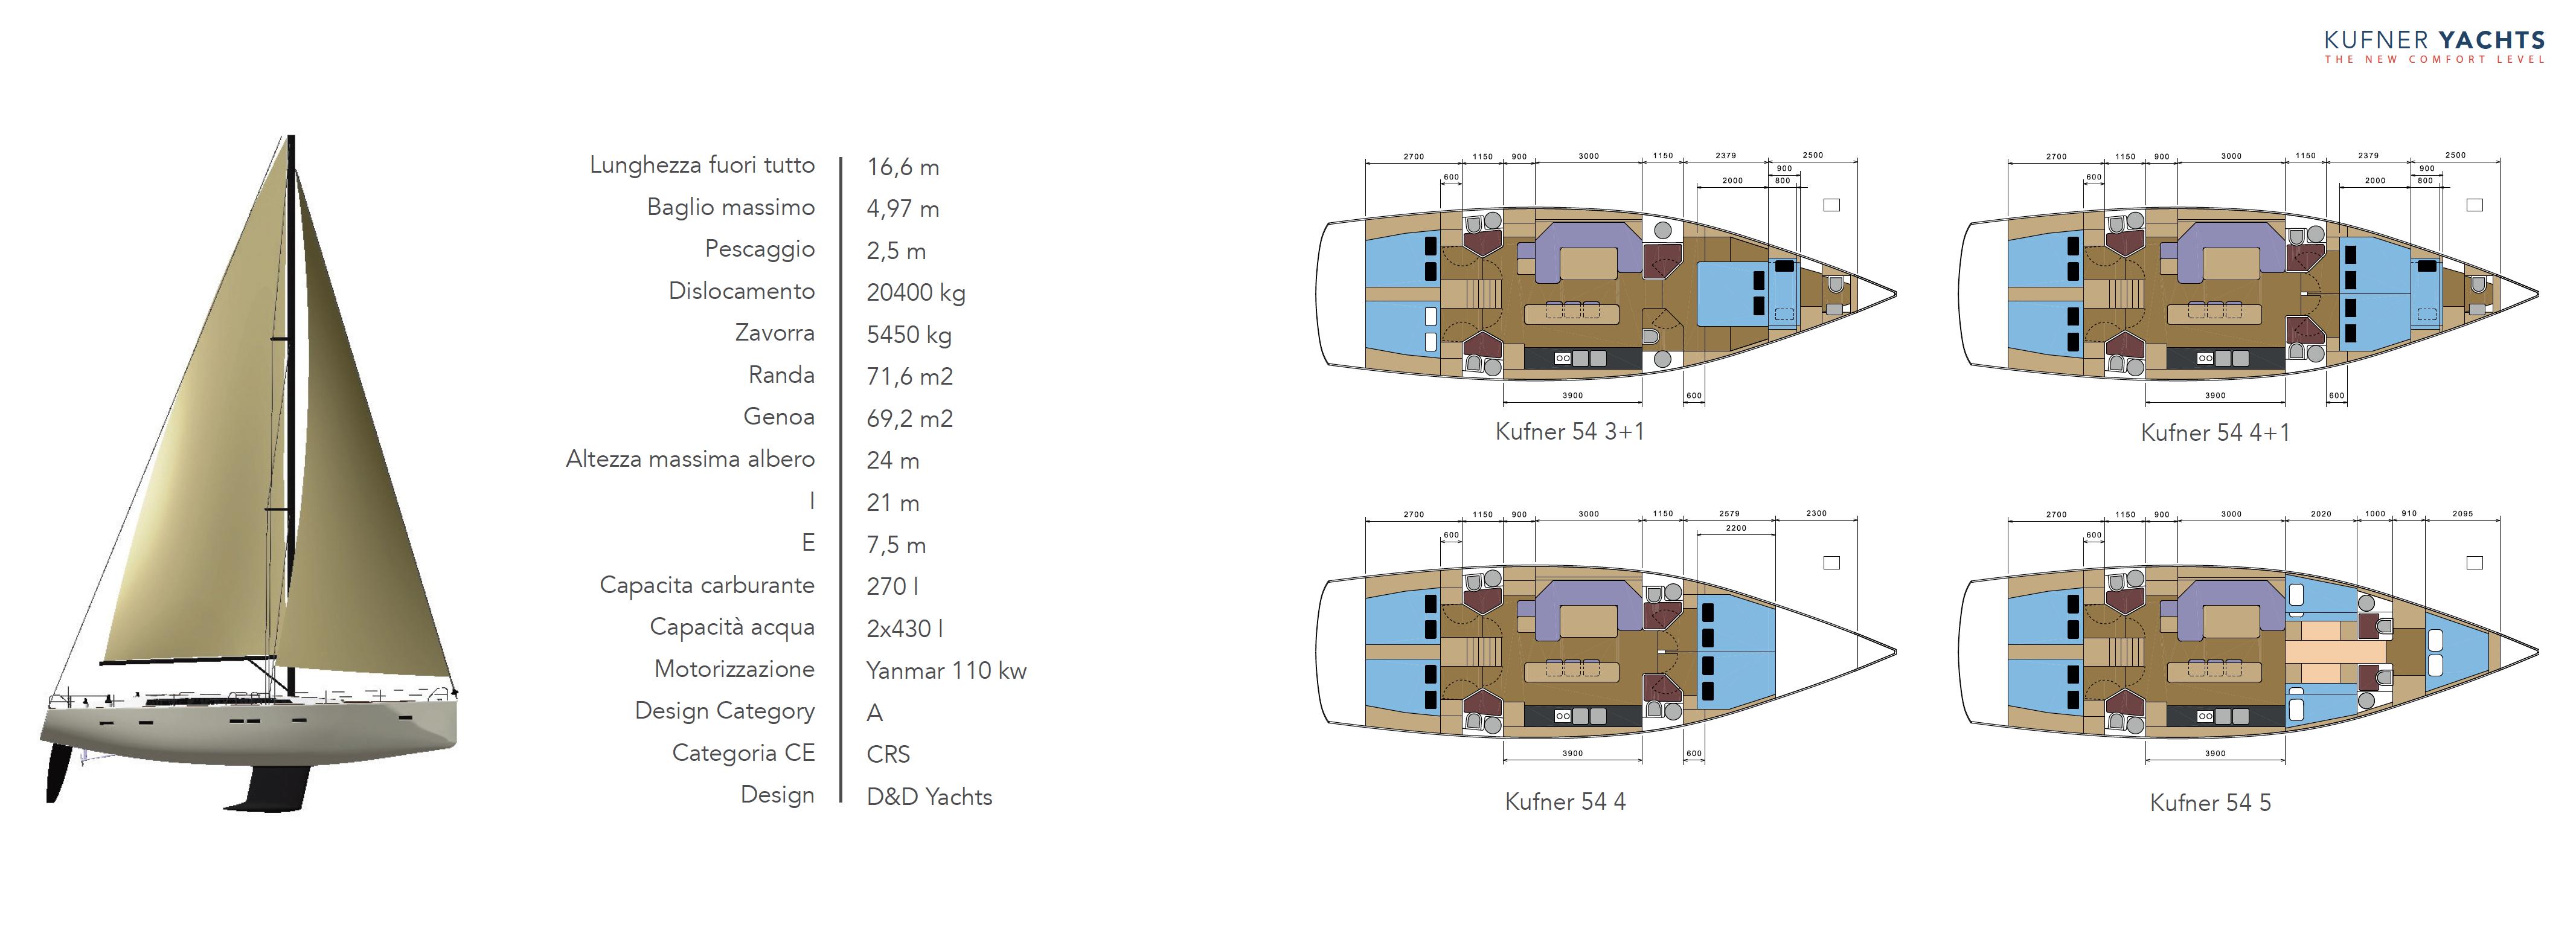 kufner yachts kufner 54 tech specs